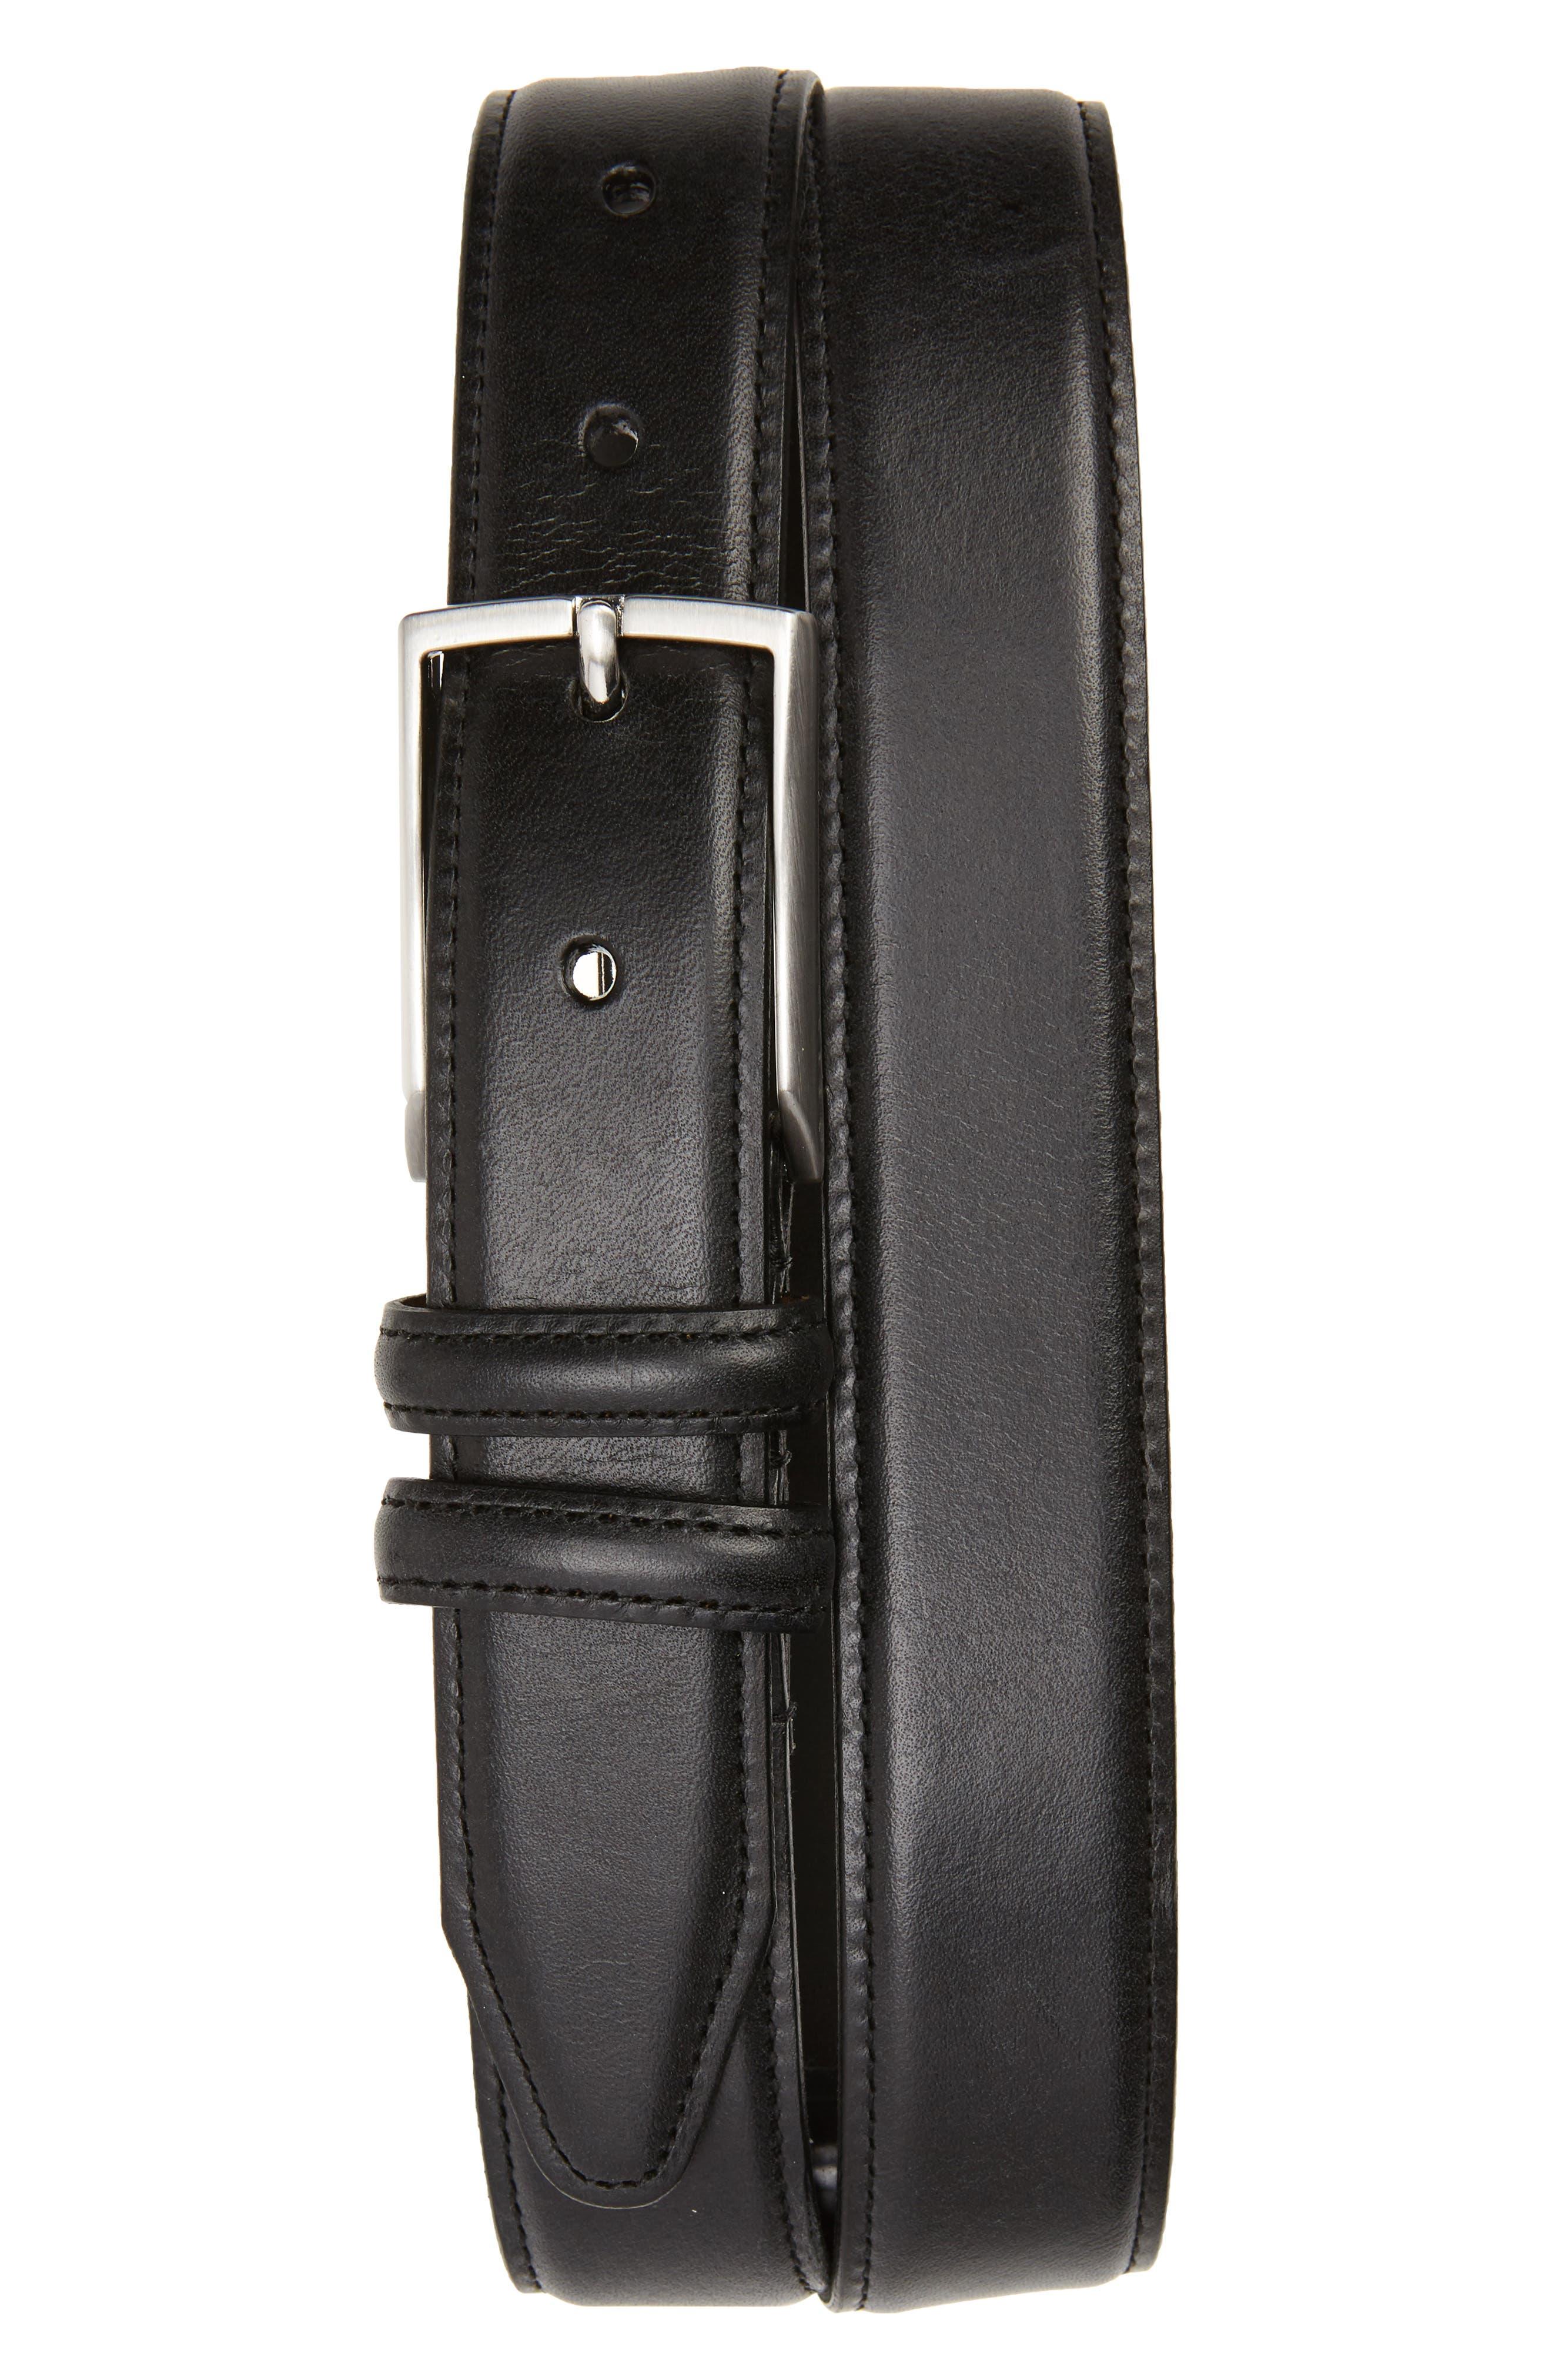 NORDSTROM MEN'S SHOP, Carter Leather Dress Belt, Main thumbnail 1, color, BLACK